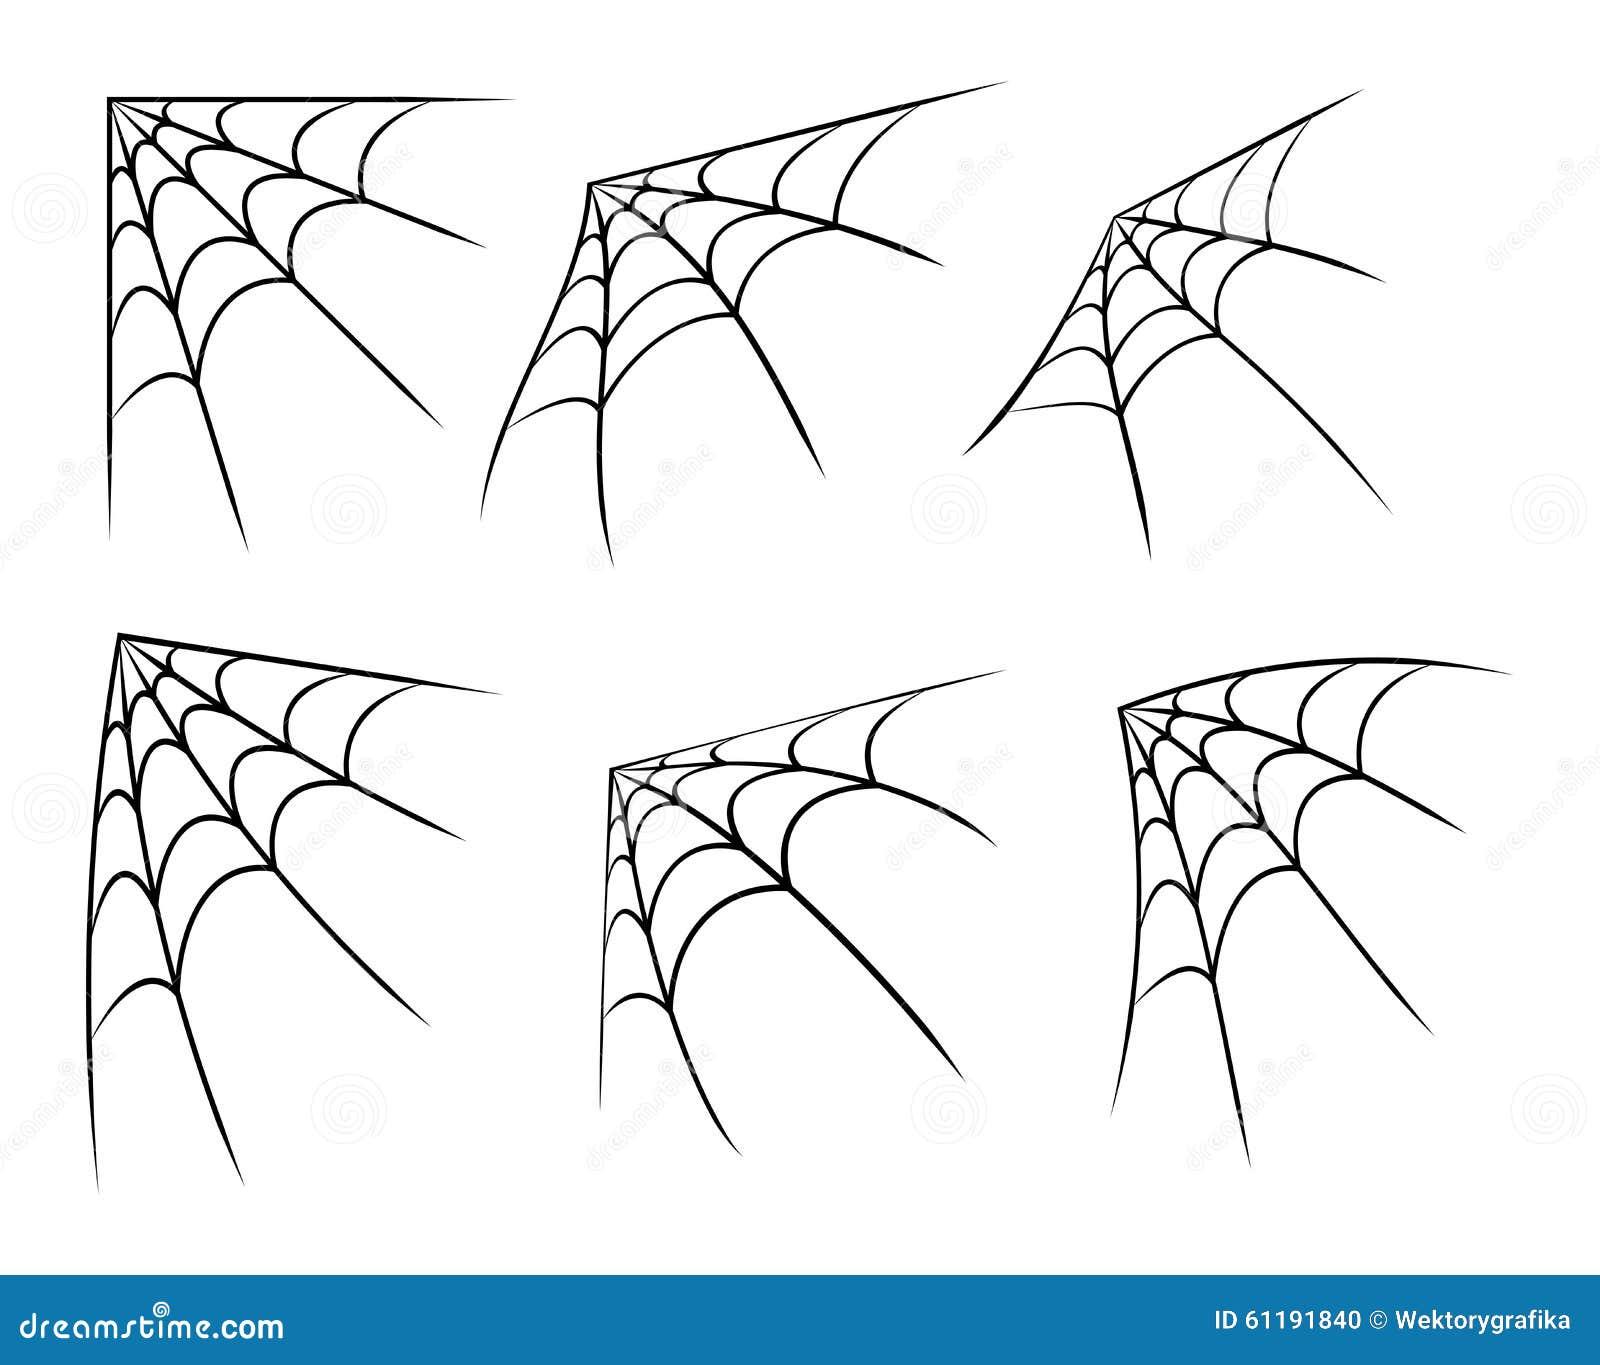 Halloween Acculent La Toile D Araignée Symbole De Toile D